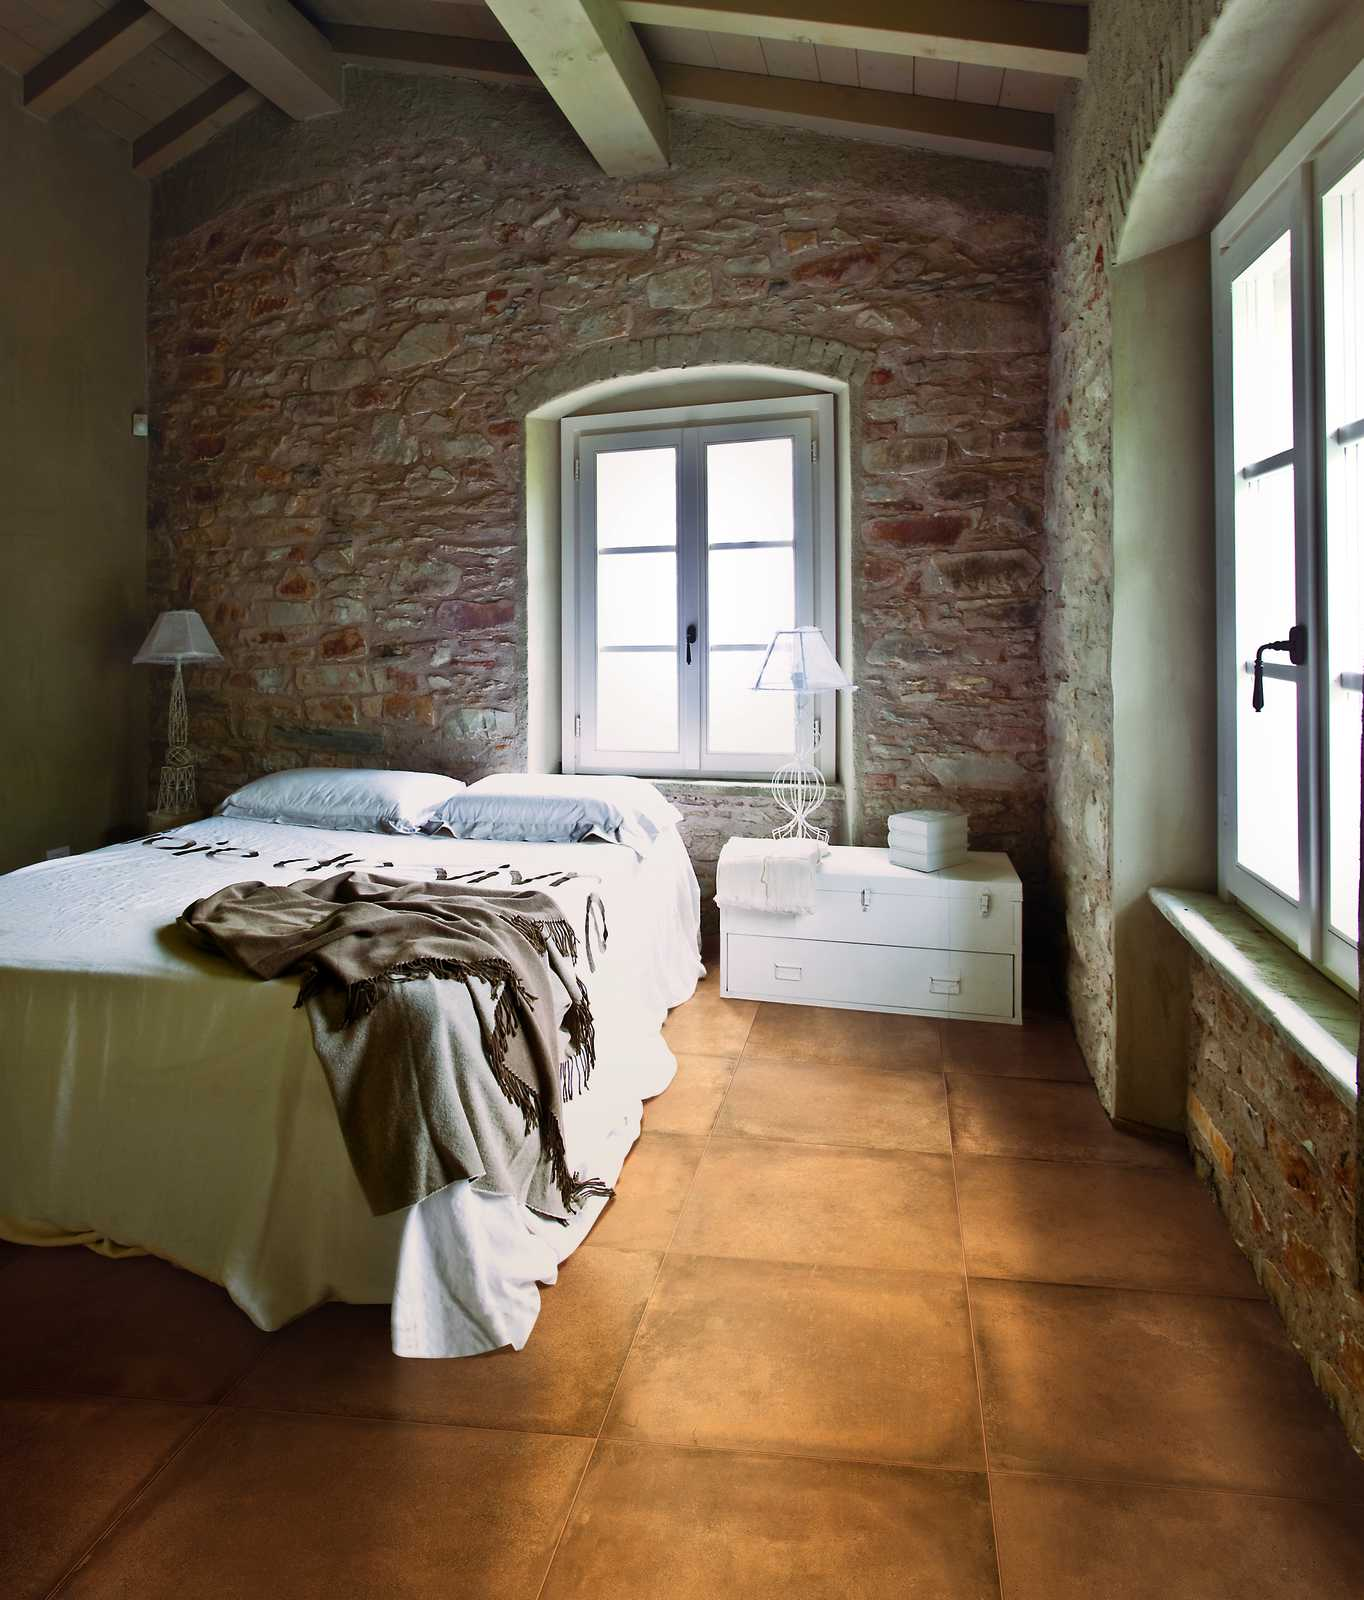 Bedroom Tiles Ceramic And Stoneware Ideas Marazzi